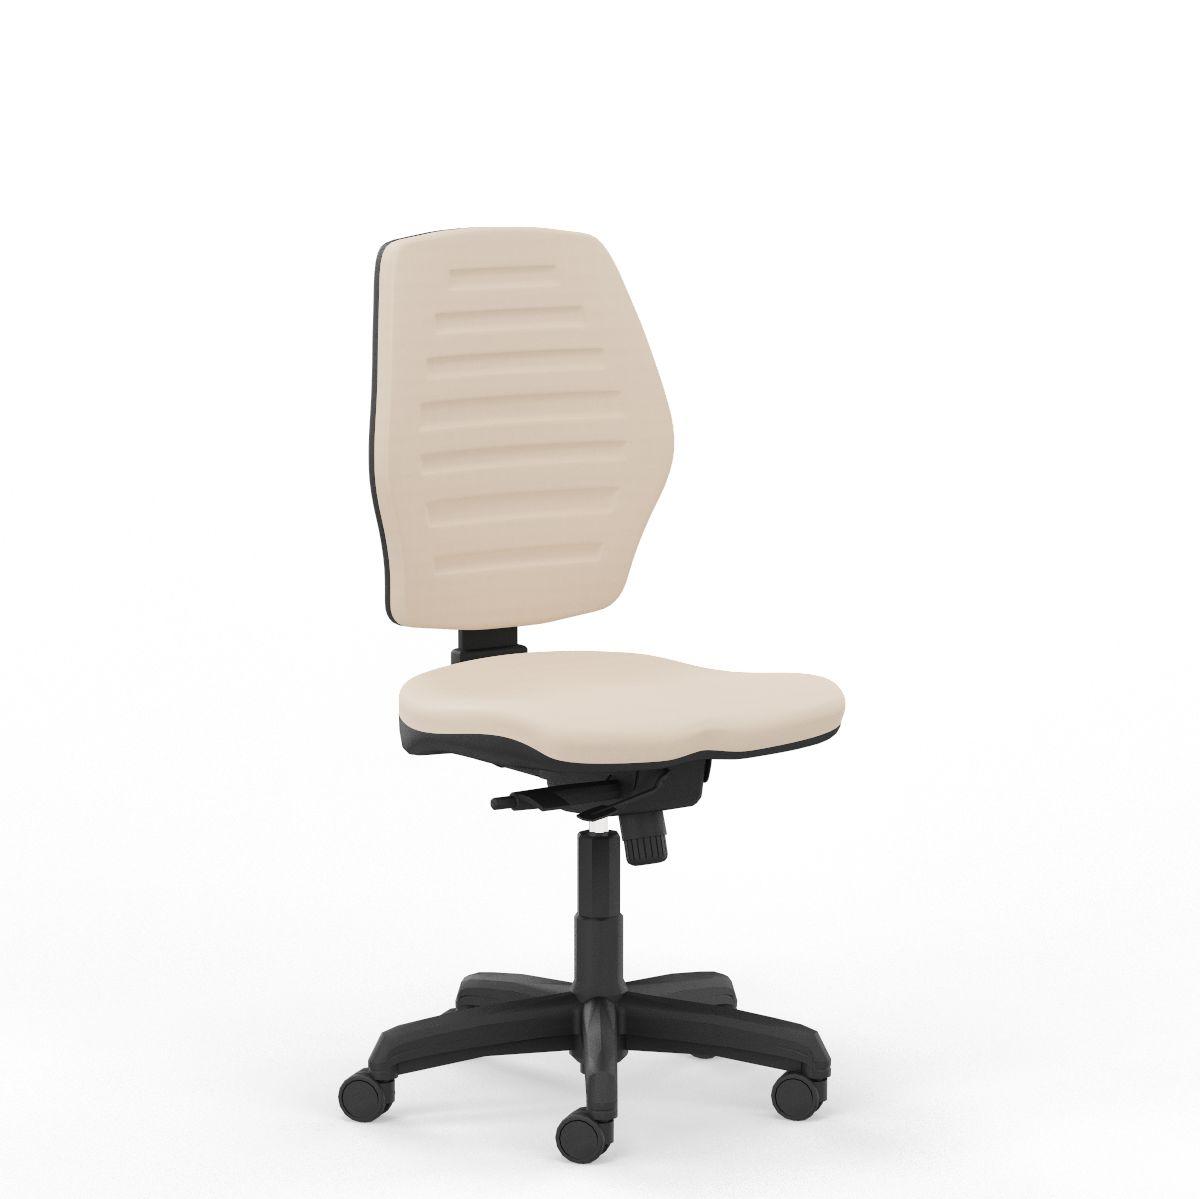 Fotel Biurowy Nowy Styl MASTER 10 TS06 IM660